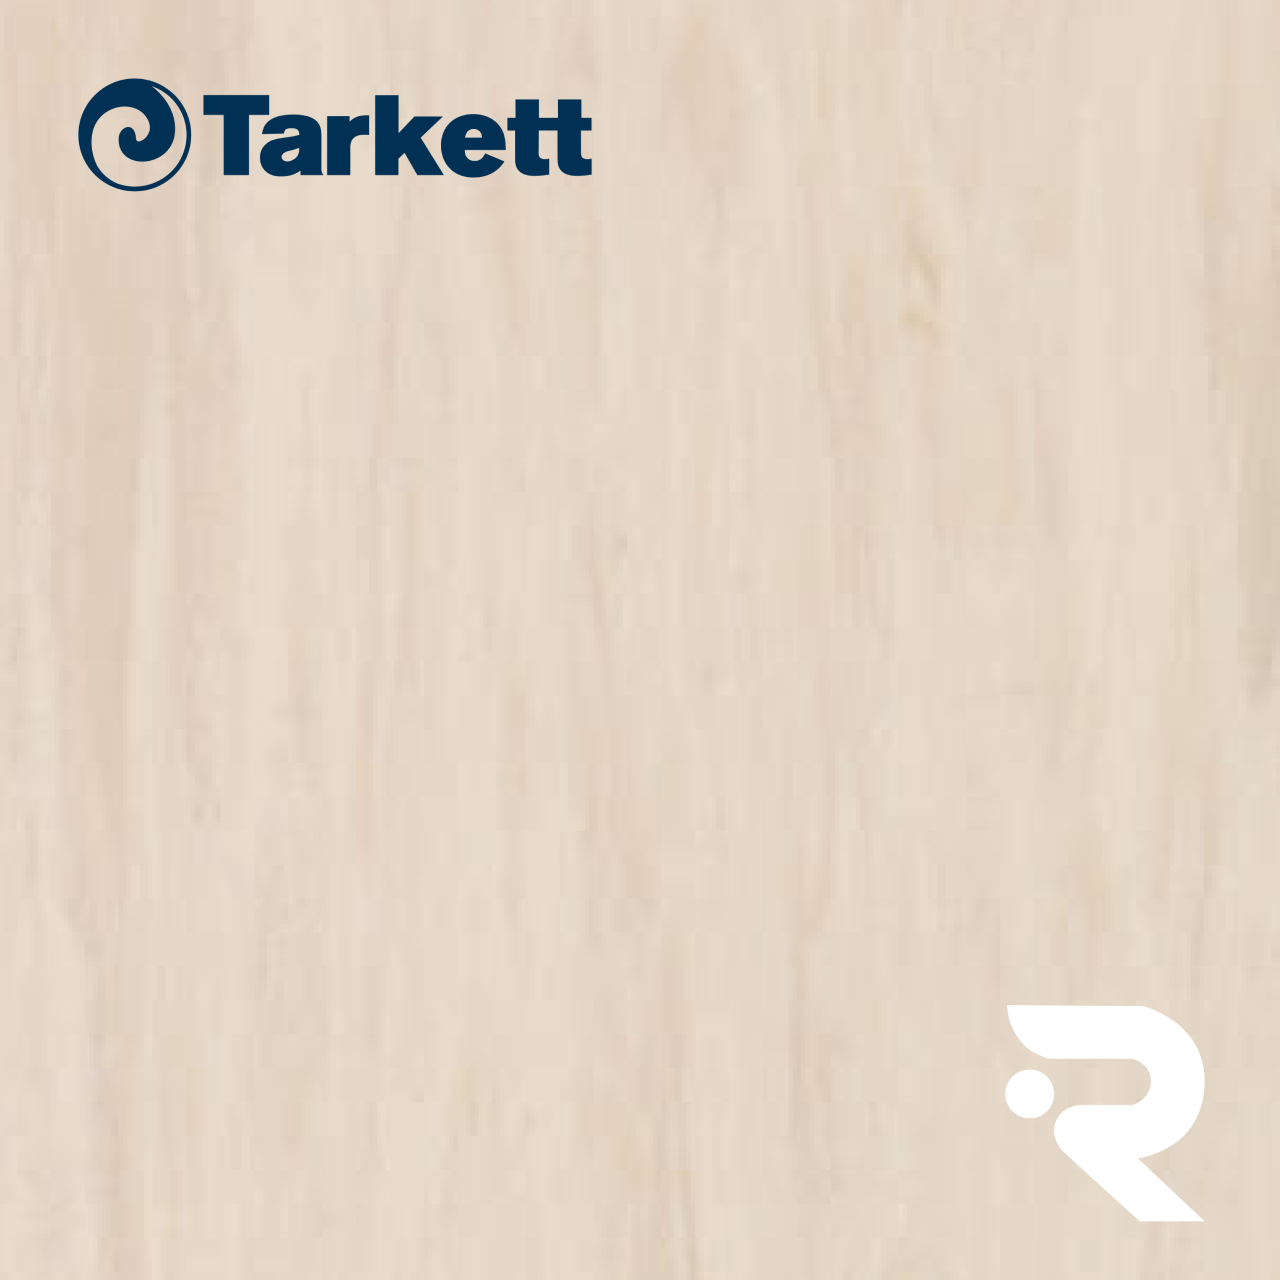 🏫 Гомогенний лінолеум Tarkett | Standard SAND LIGHT 0912 | Standard Plus 2.0 mm | 2 х 23 м